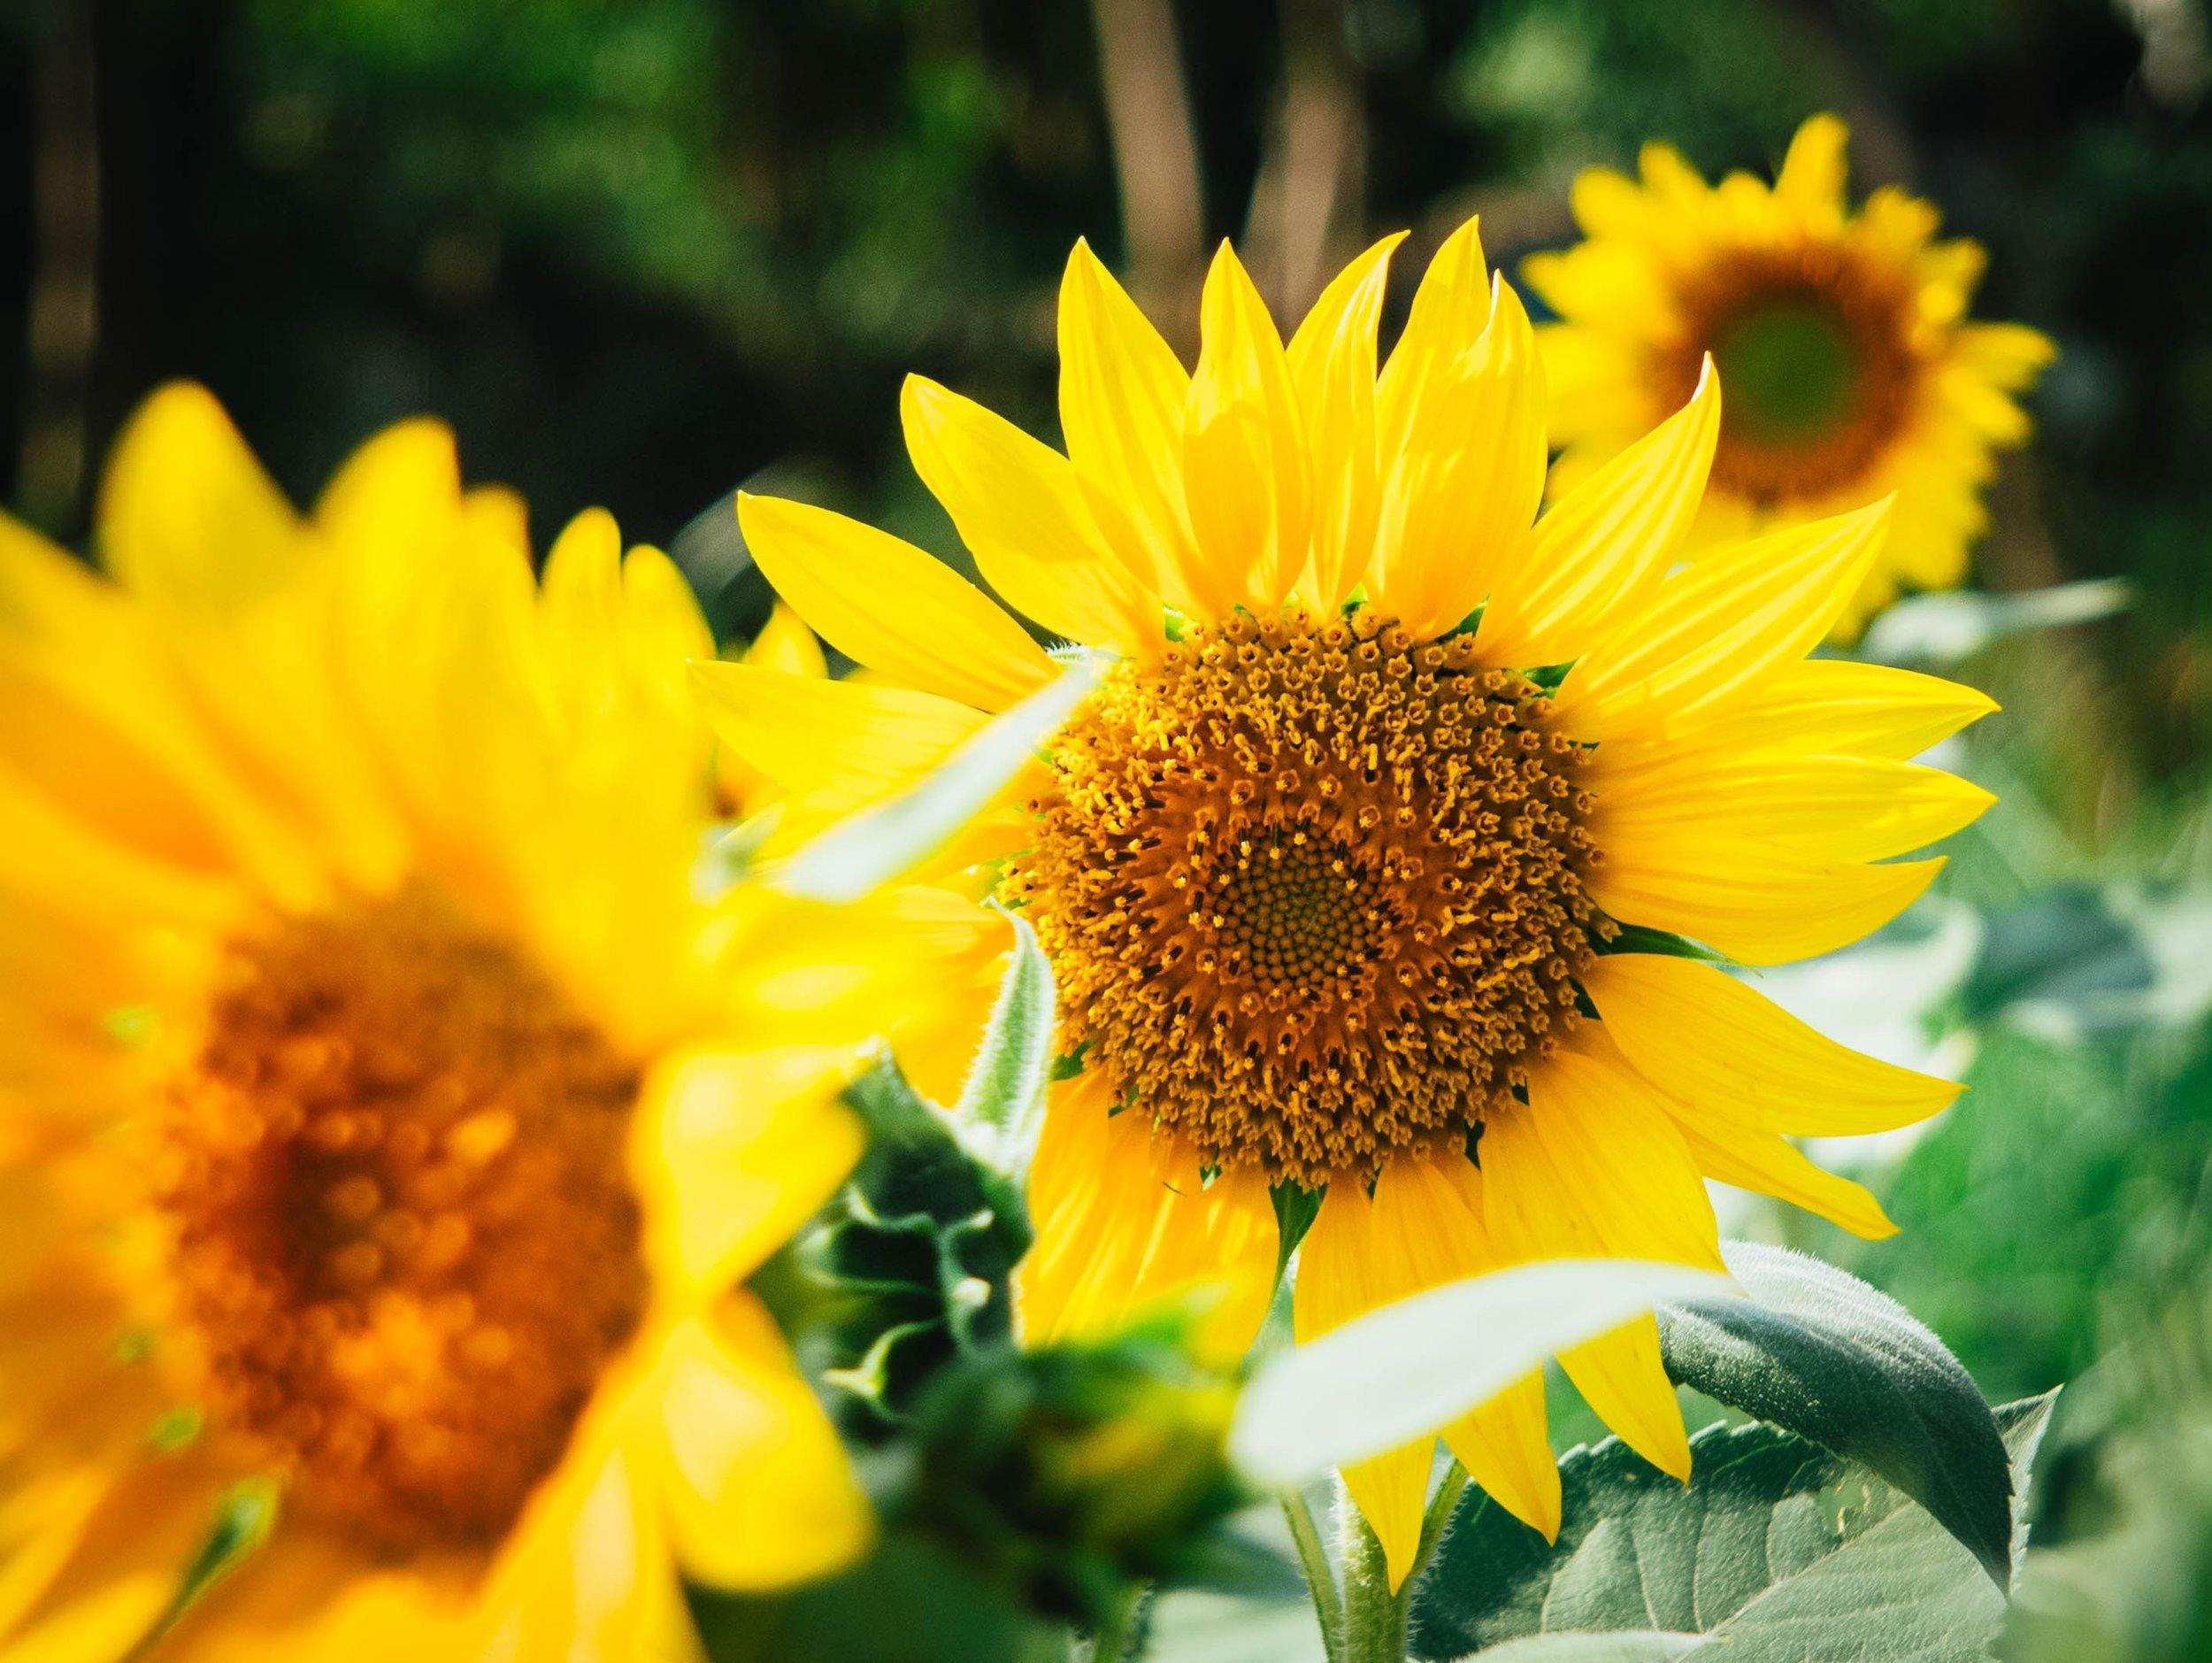 Sunflowers_papaver-rhoeas-63741-unsplash.jpg